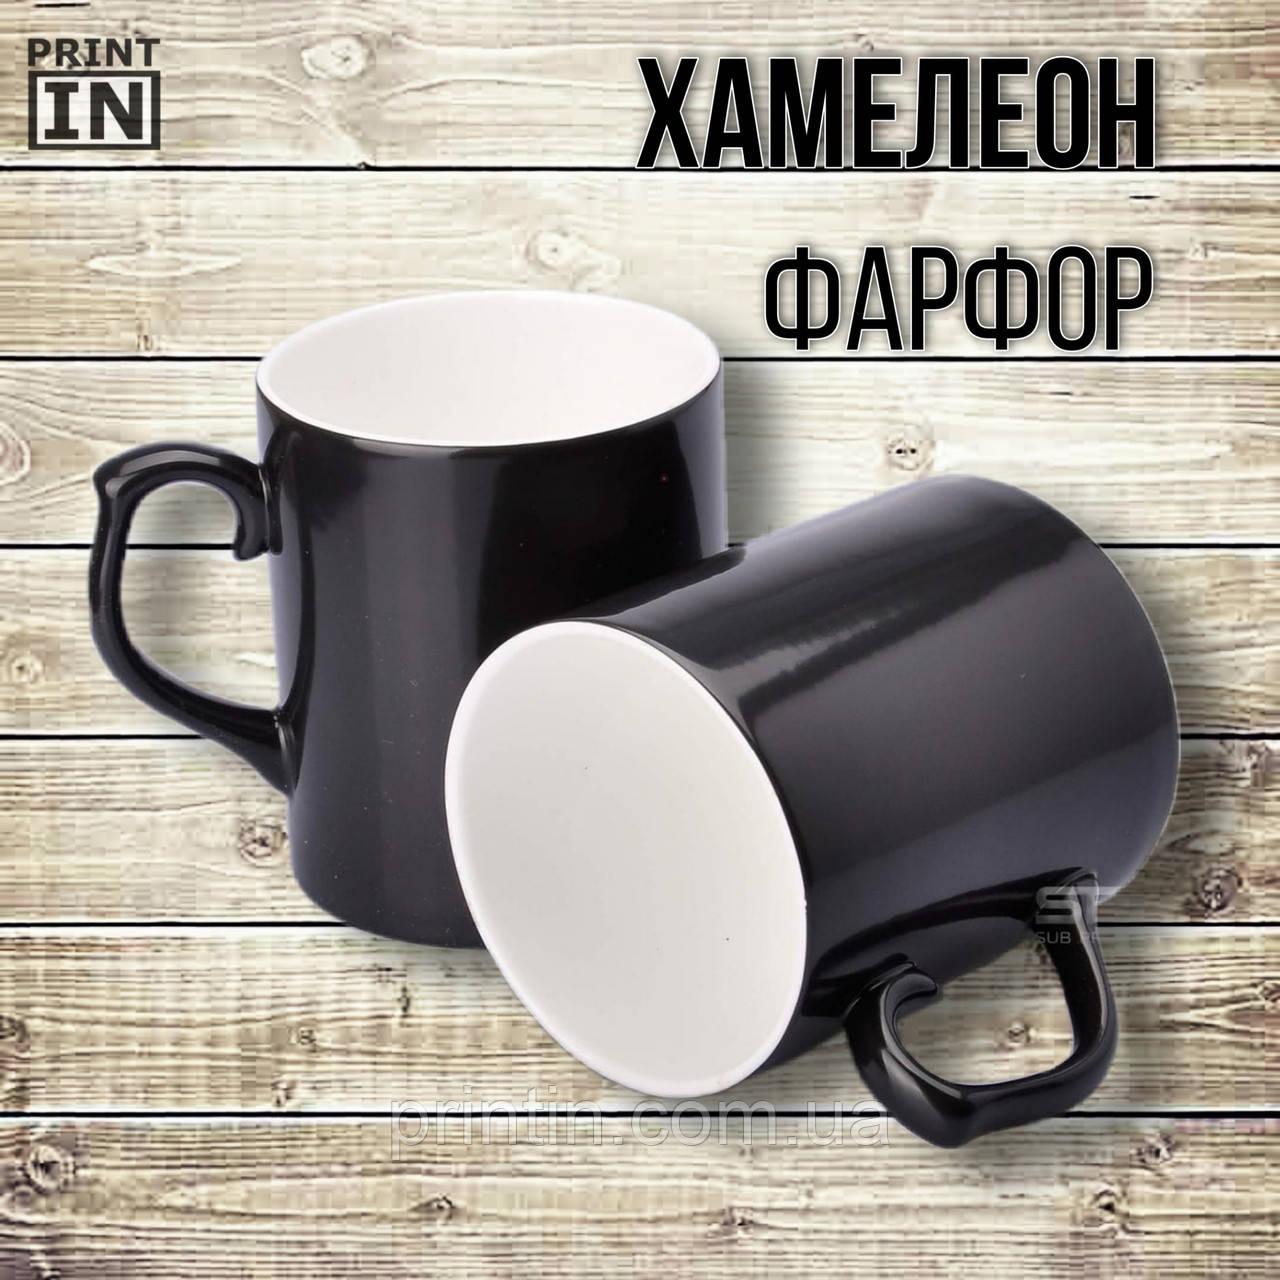 Печать на чашке хамелеон 330мл (фарфор)